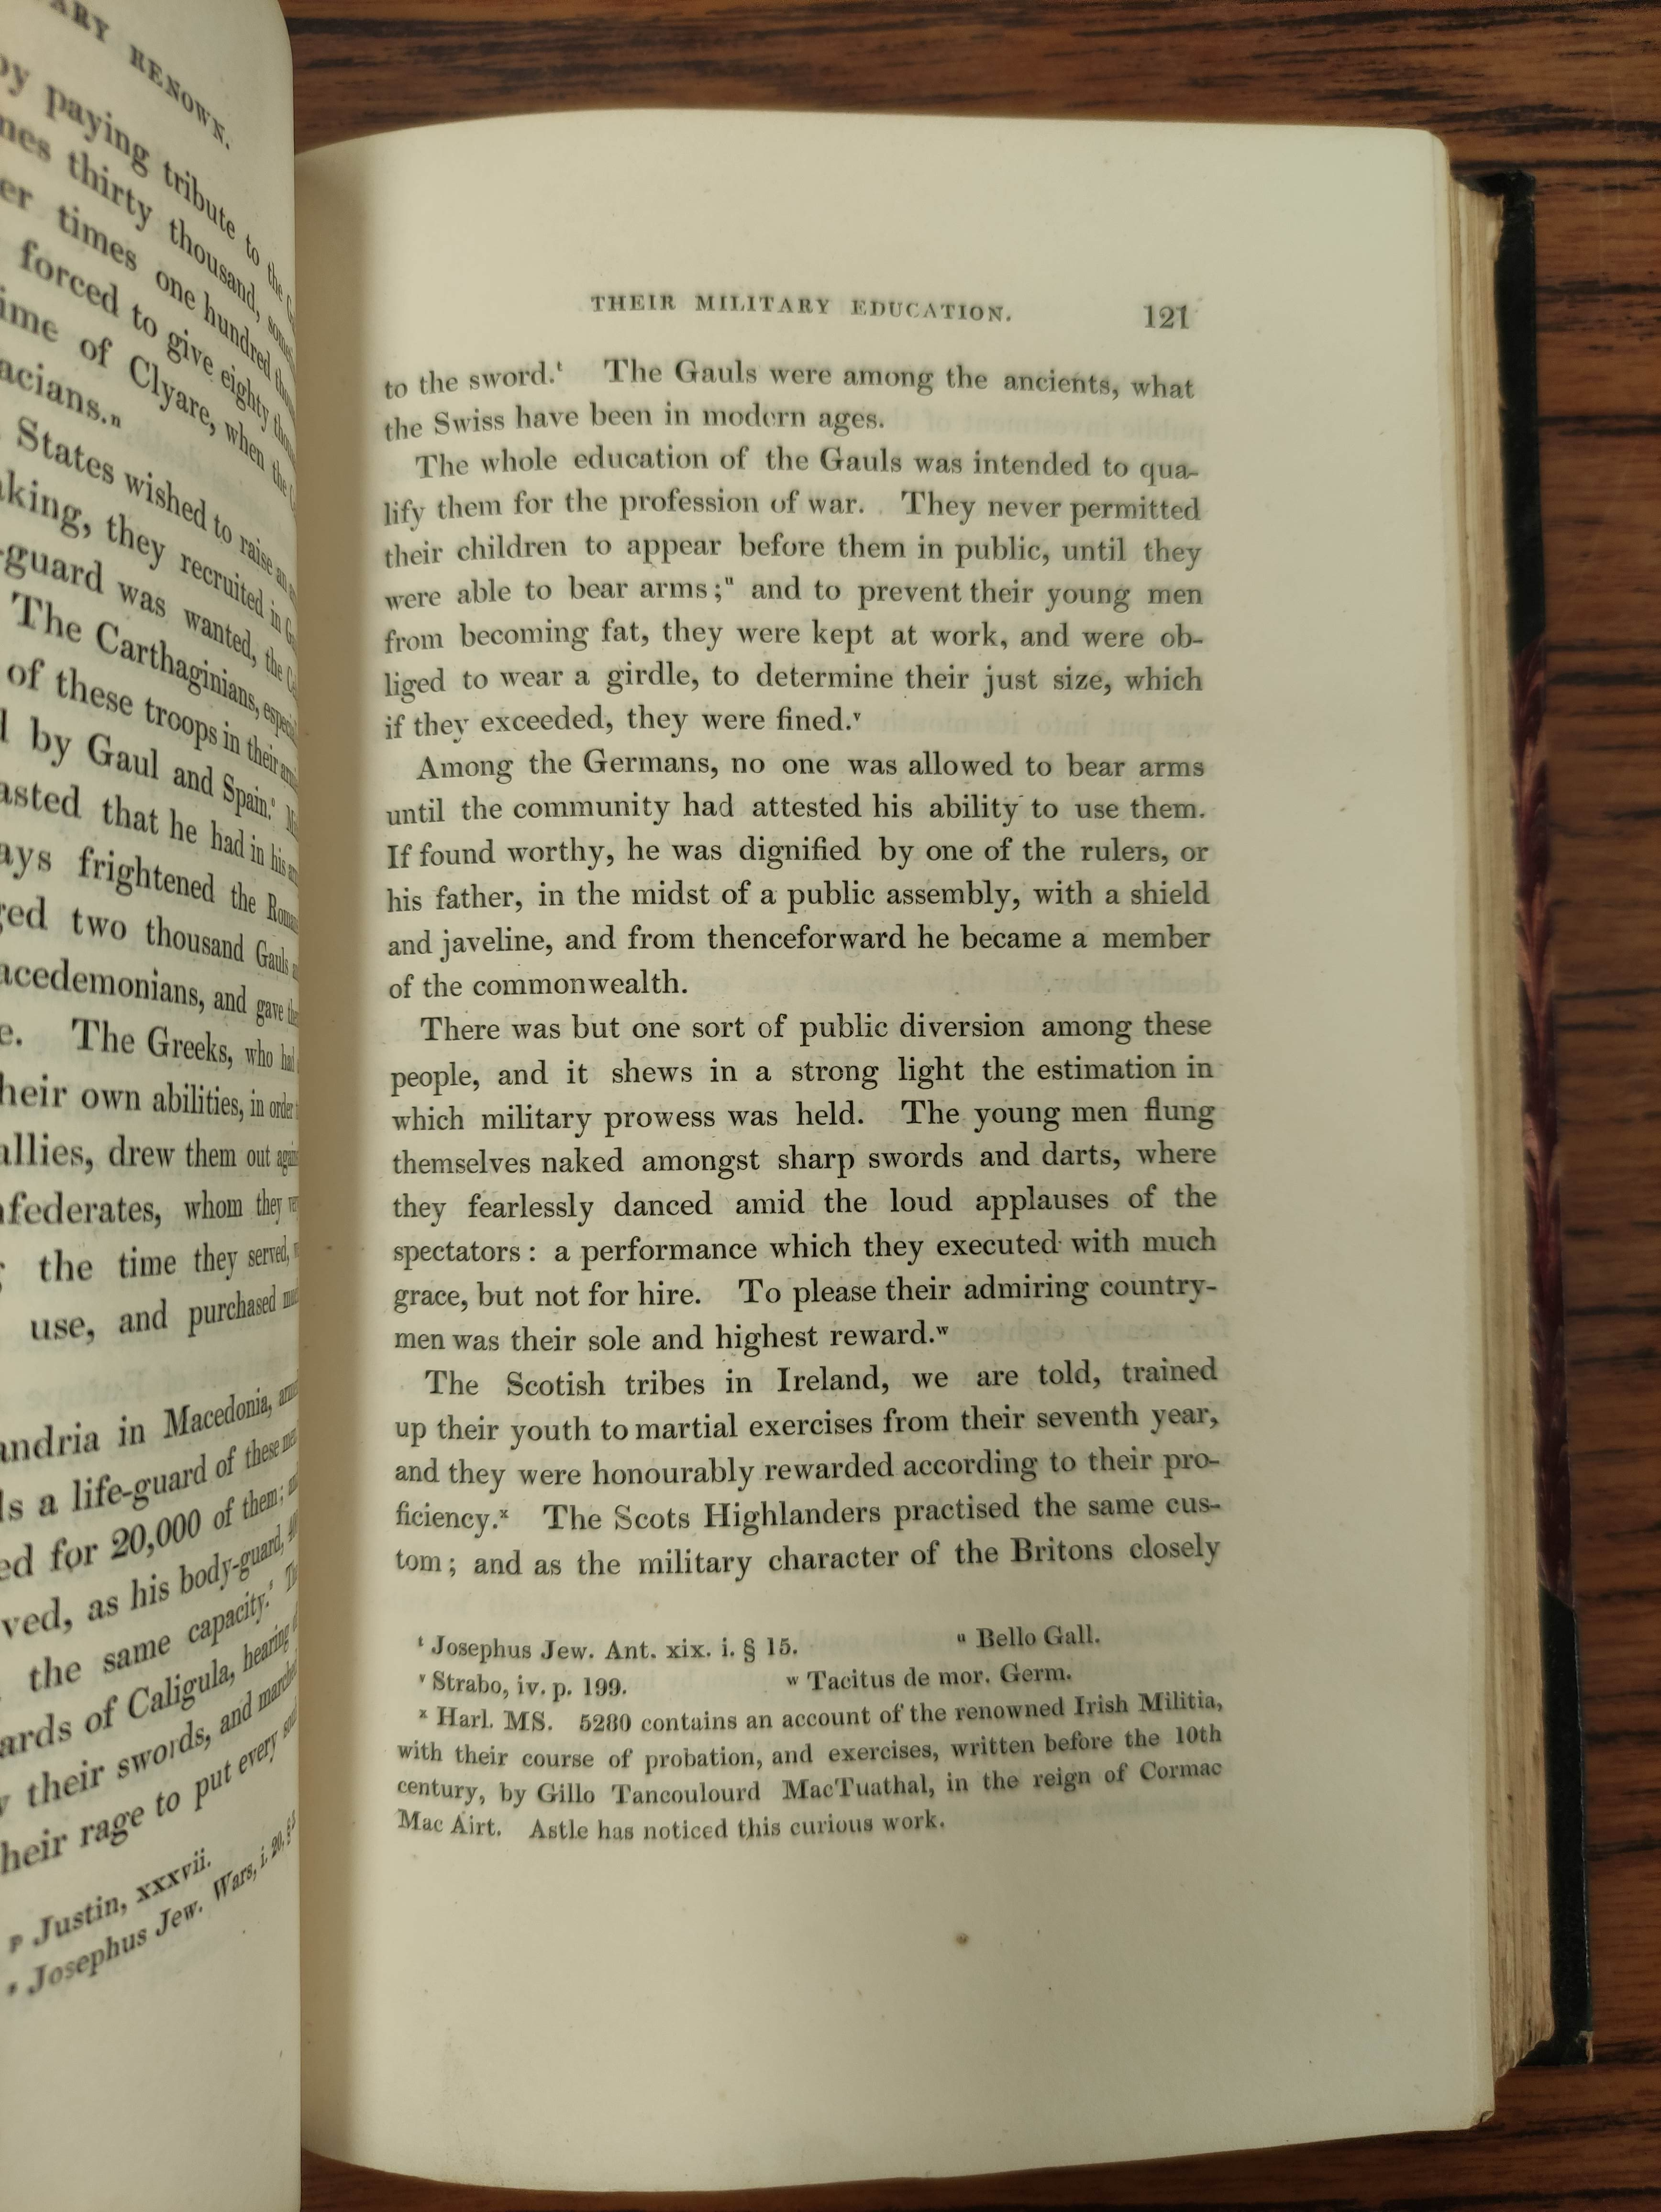 LOGAN JAMES.The Scottish Gael. 2 vols. Col. frontis & text illus. Half green morocco. A nice - Image 7 of 10